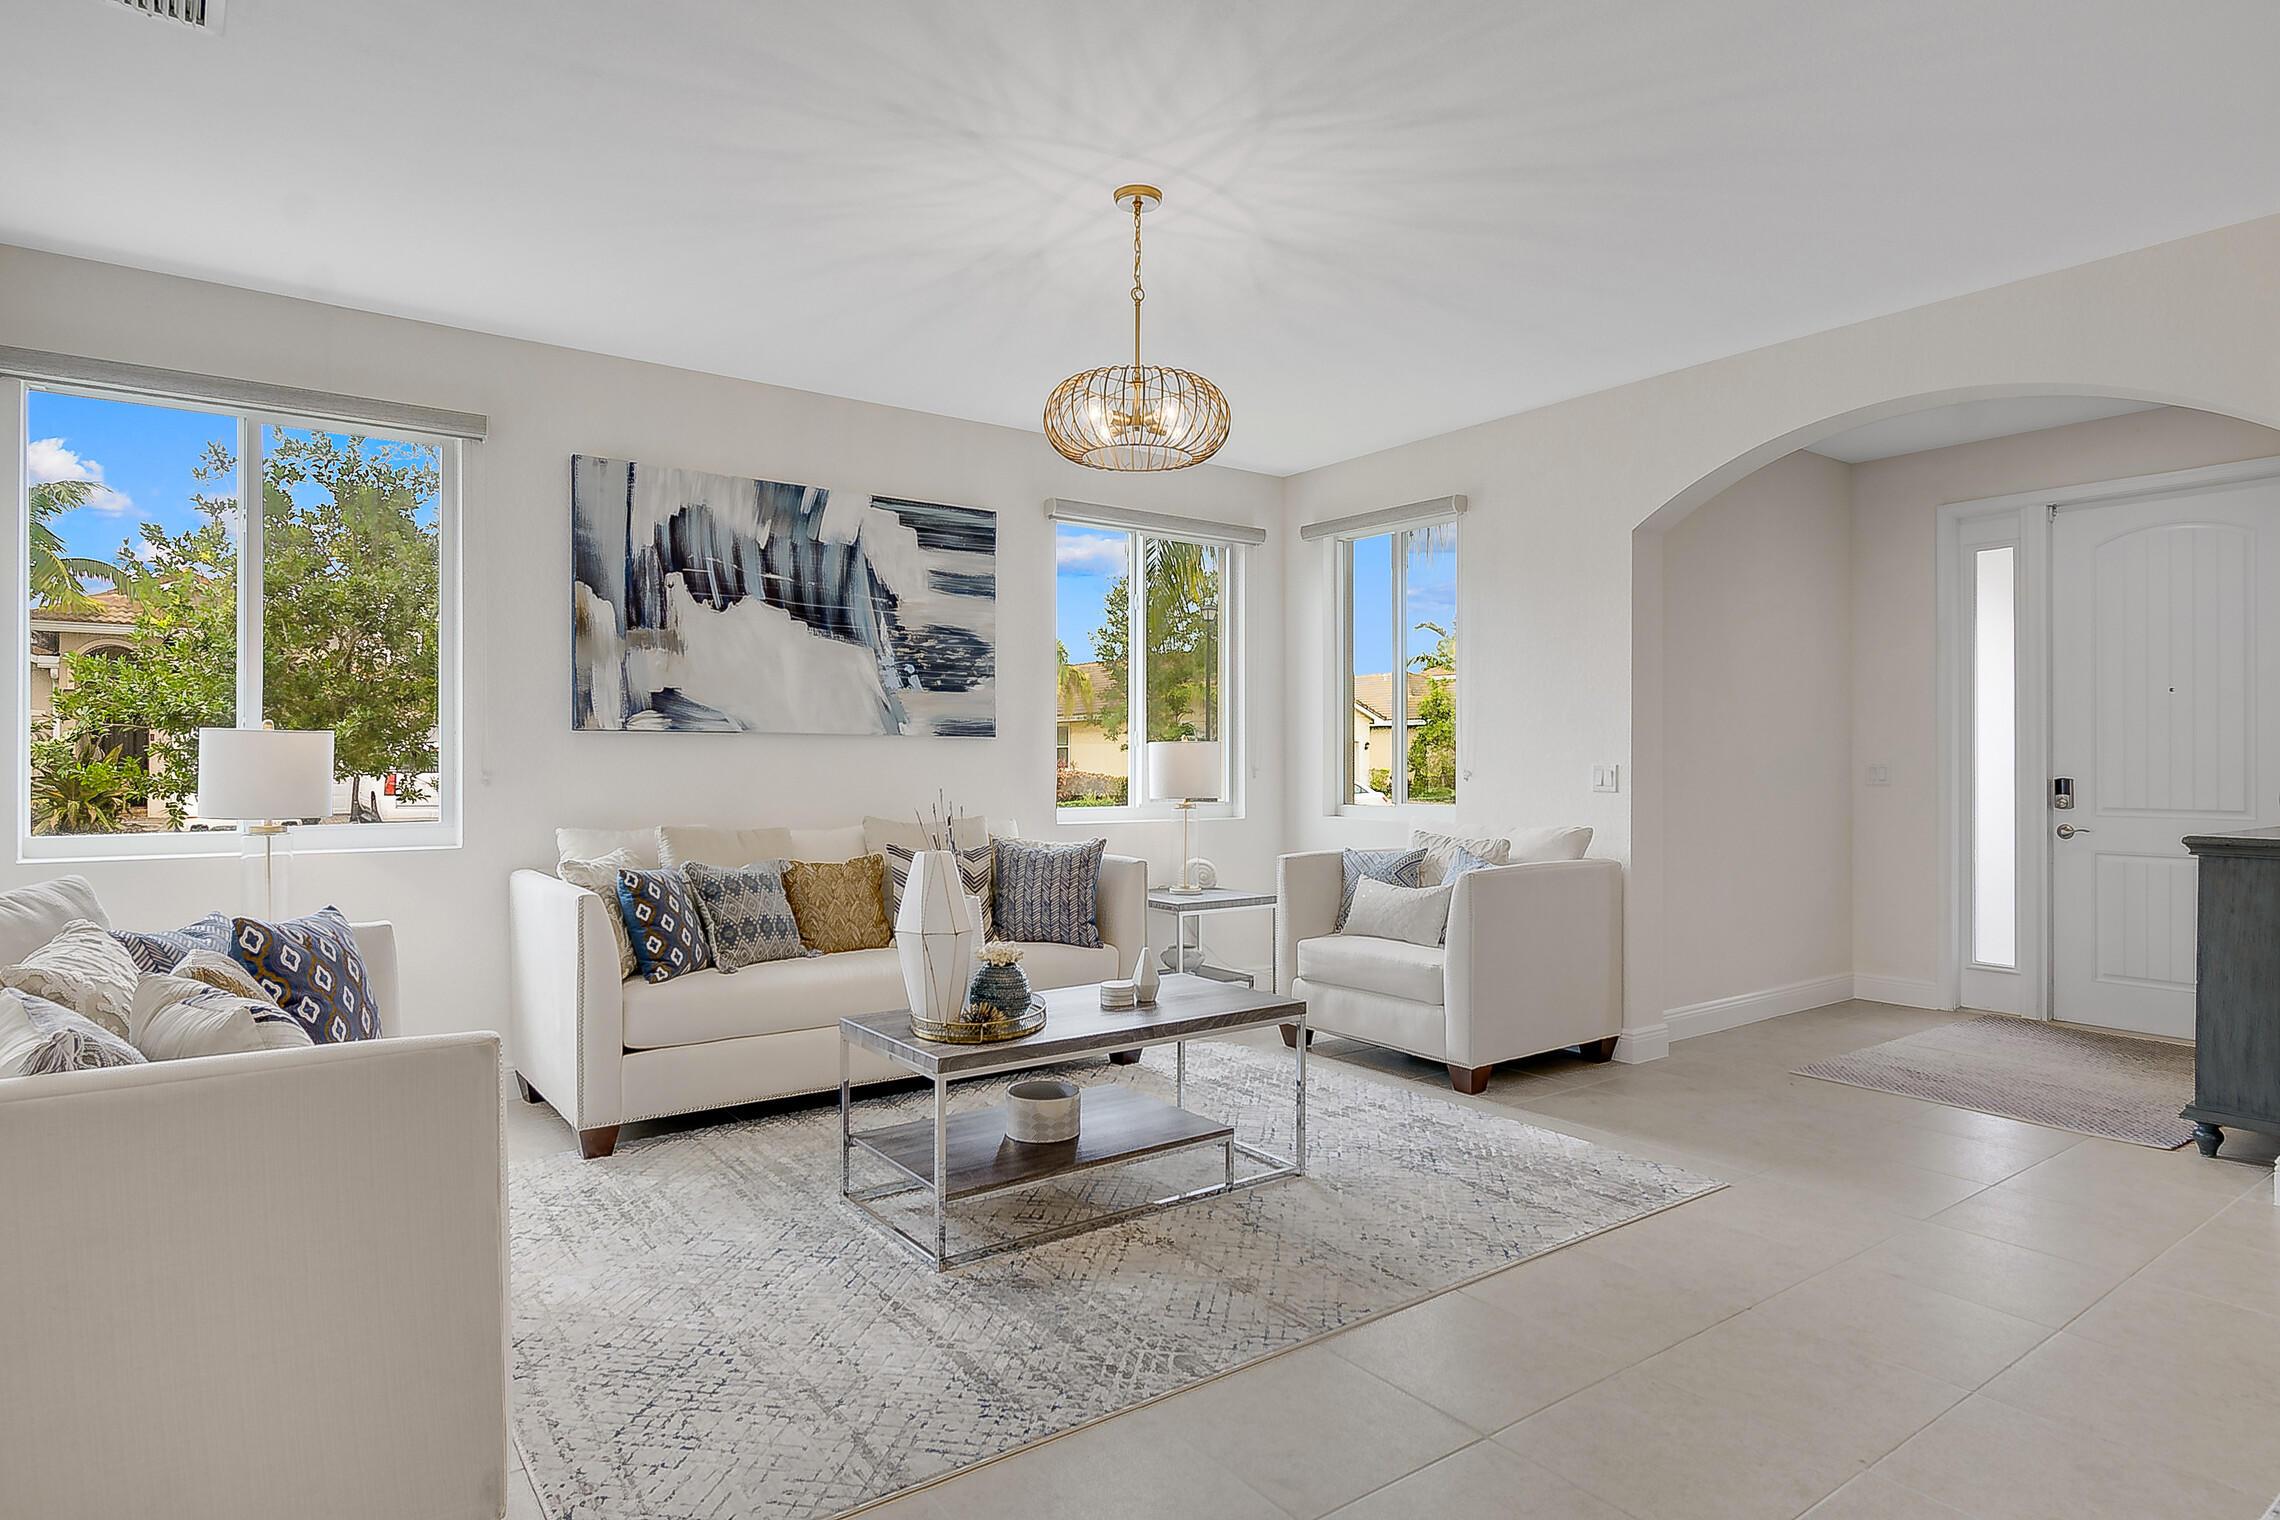 Home for sale in Emerald Cove Haverhill Florida